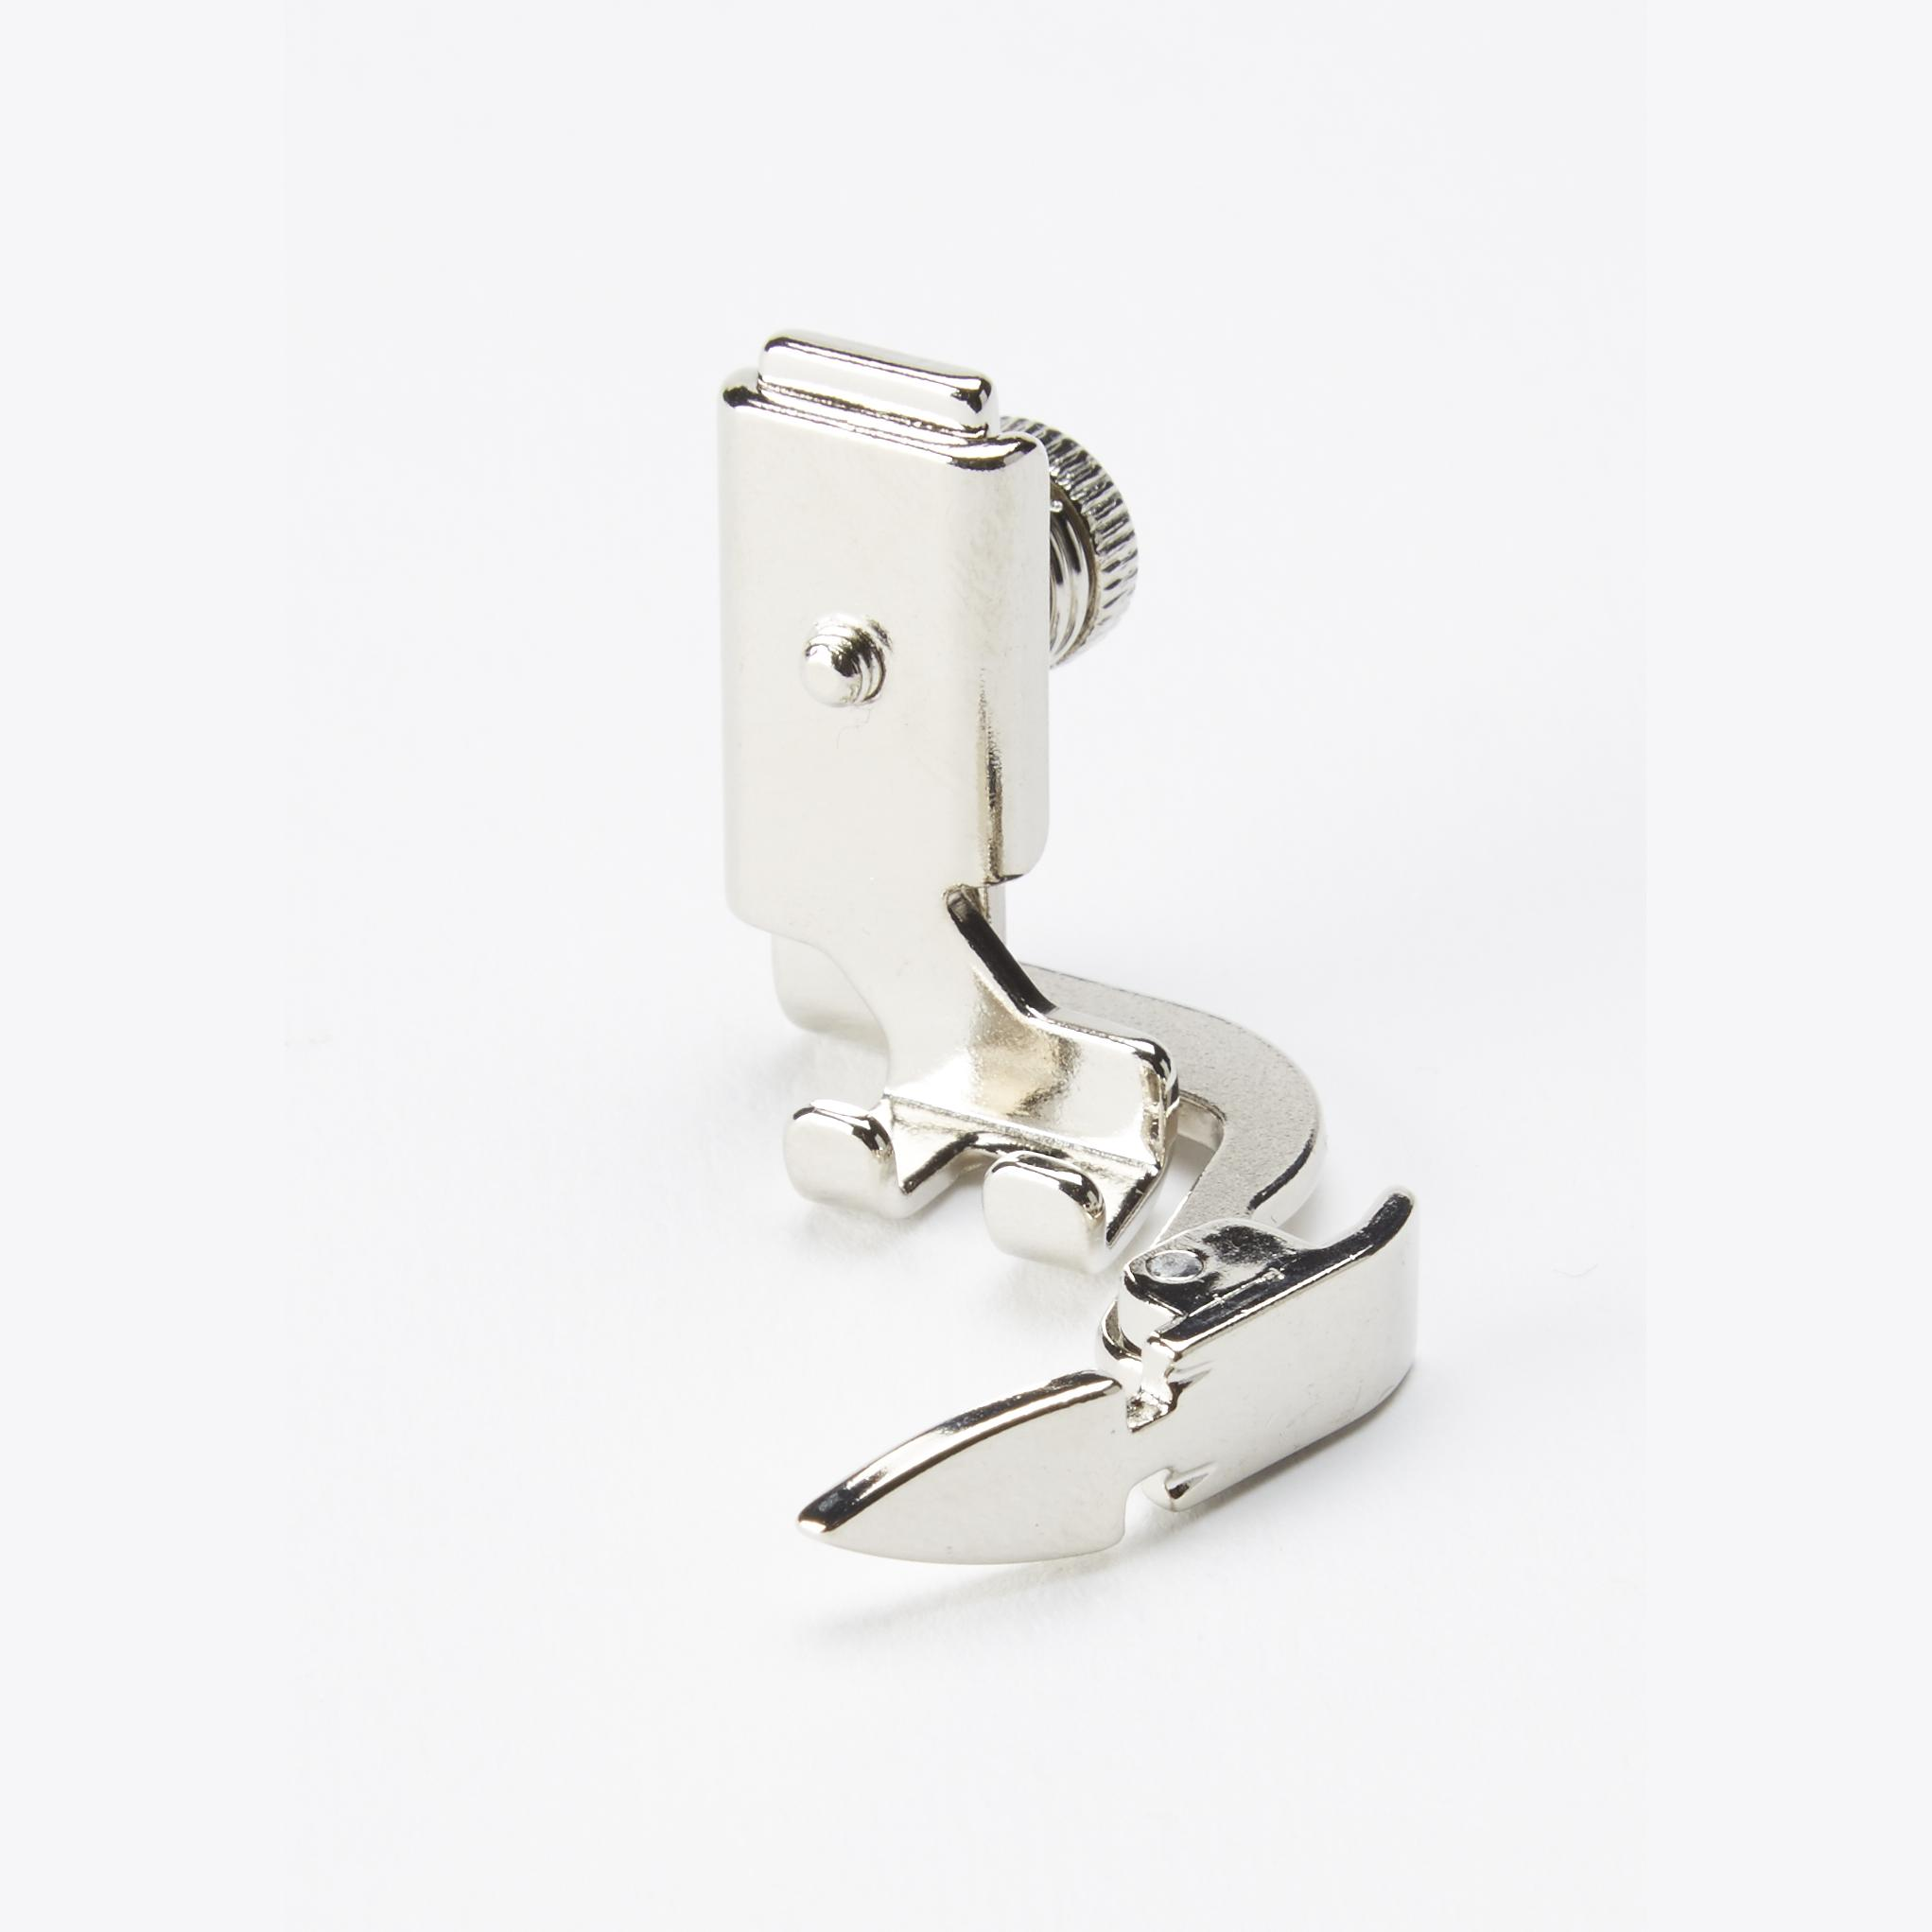 Combination Cording - Zipper Foot Low Shank-0